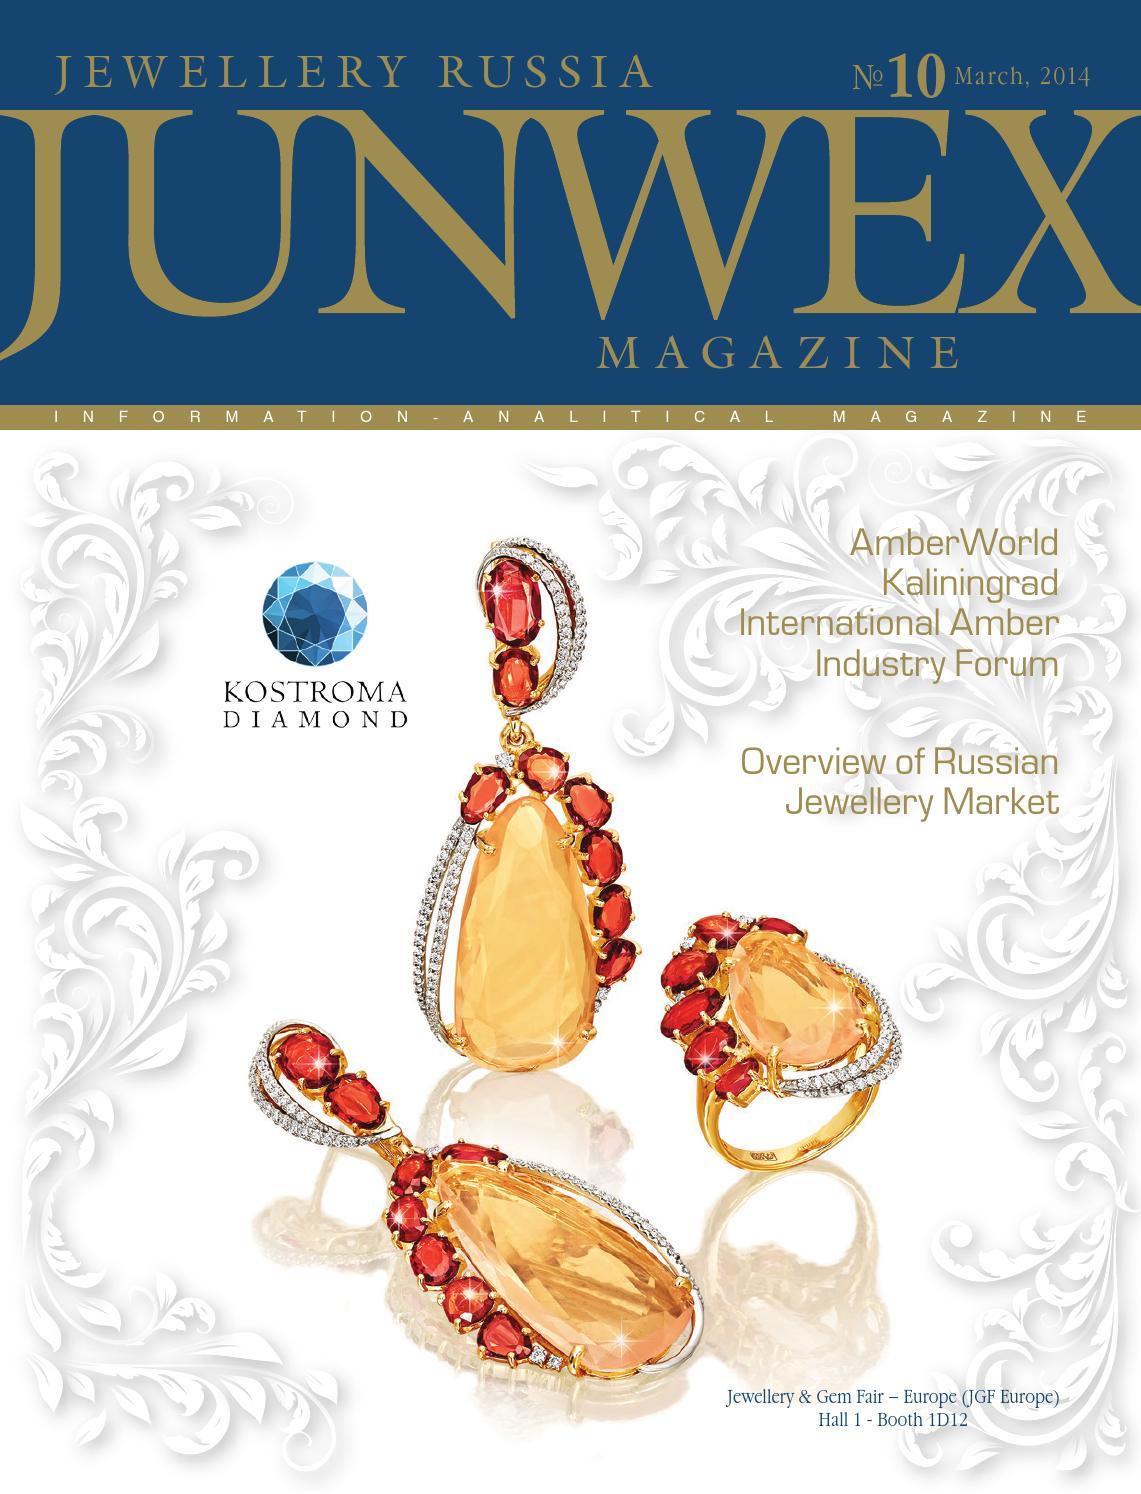 Jewellery Russia 10 by JUNWEX   issuu